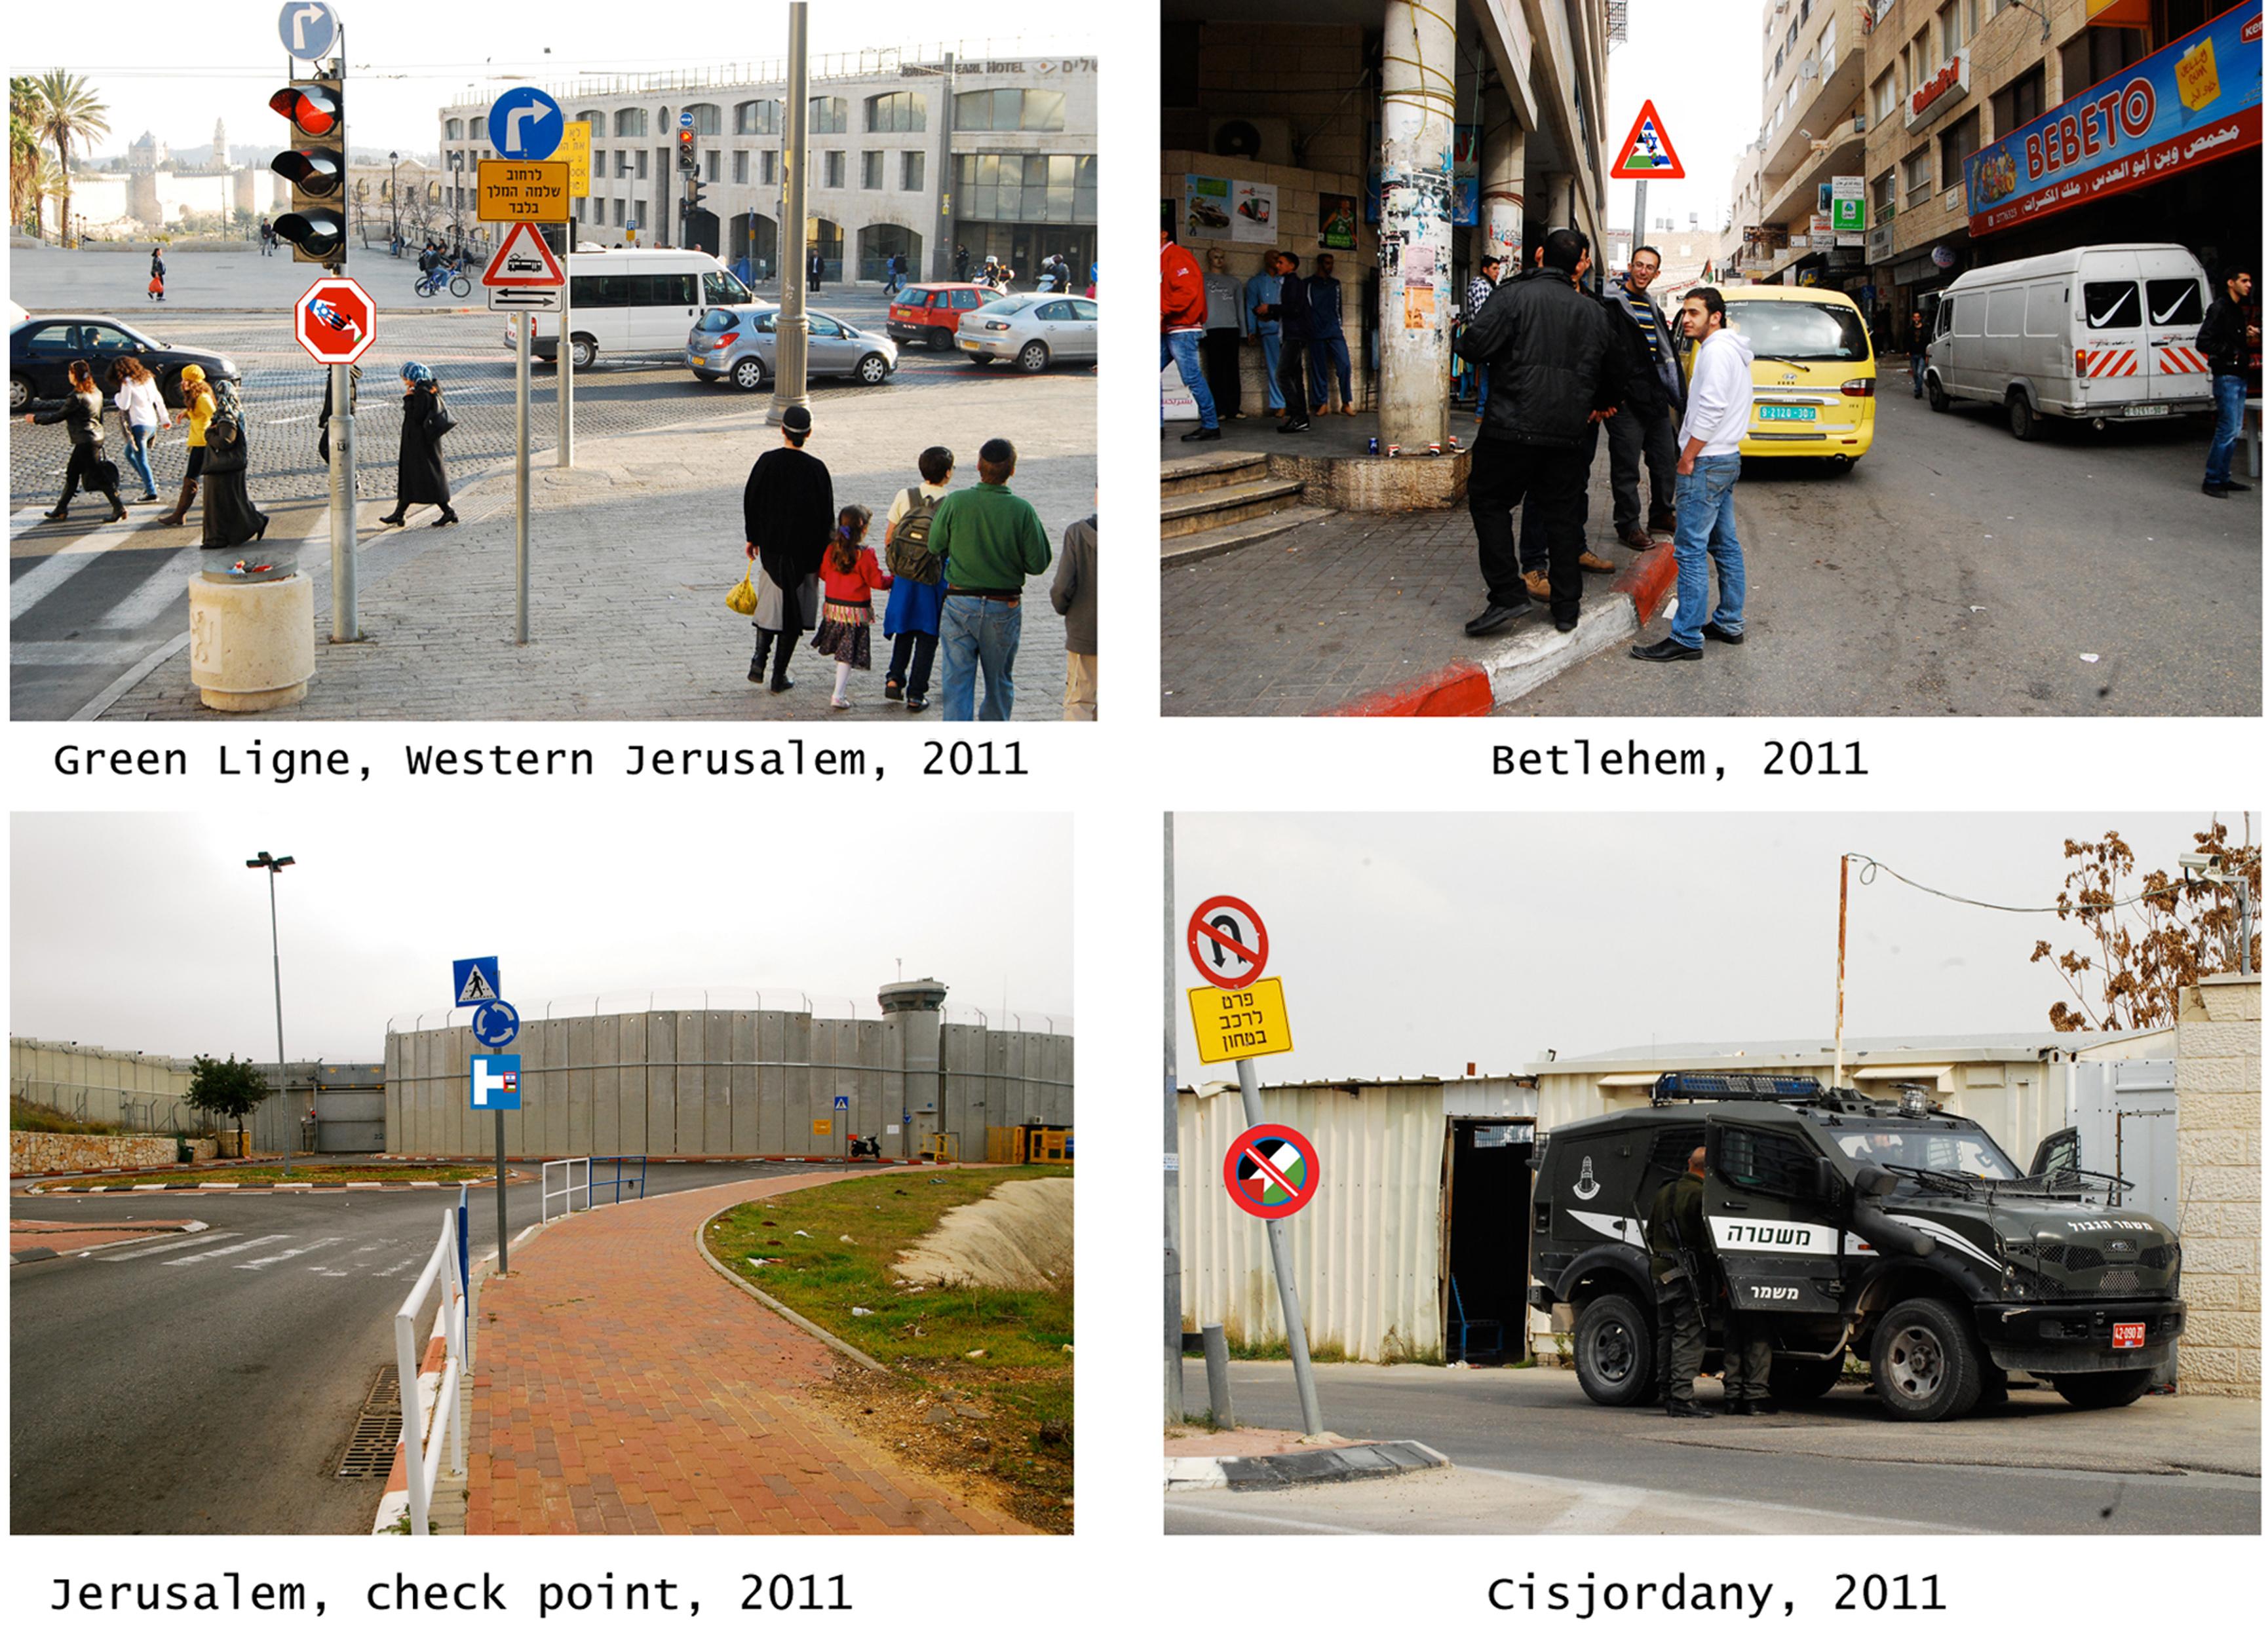 Signal-Ethic, 2011